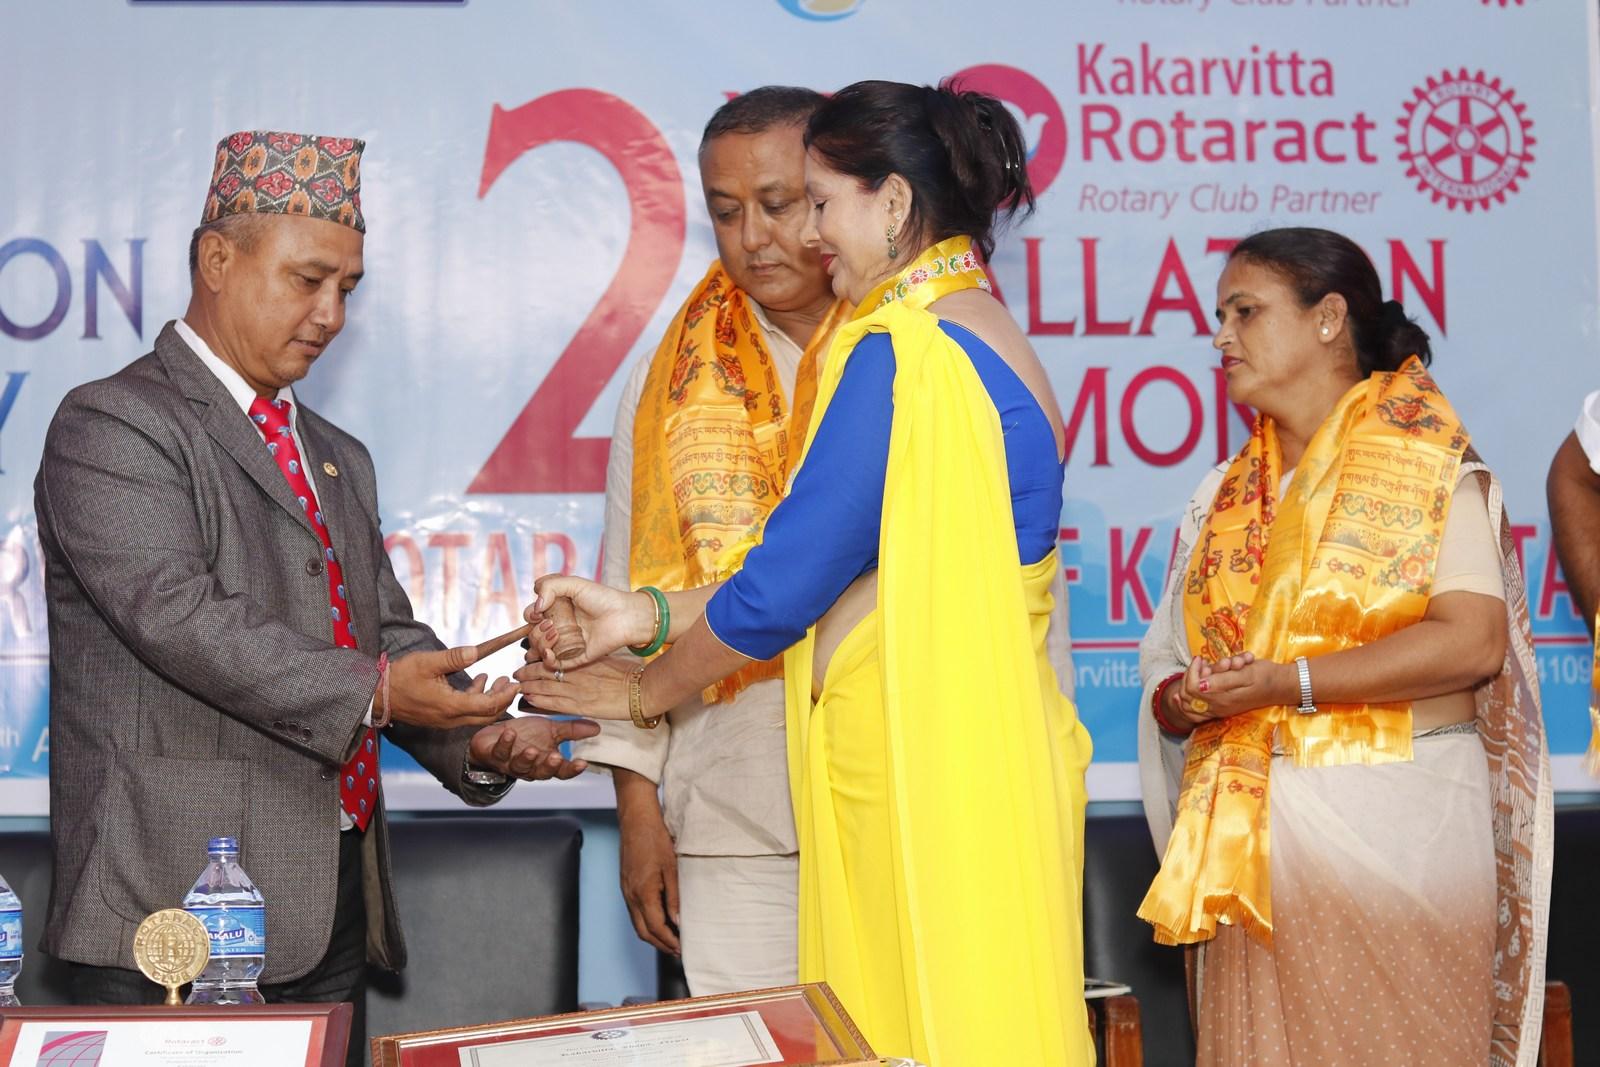 8th-Installation-Ceremony-Rotary-Club-of-Kakarvitta-34